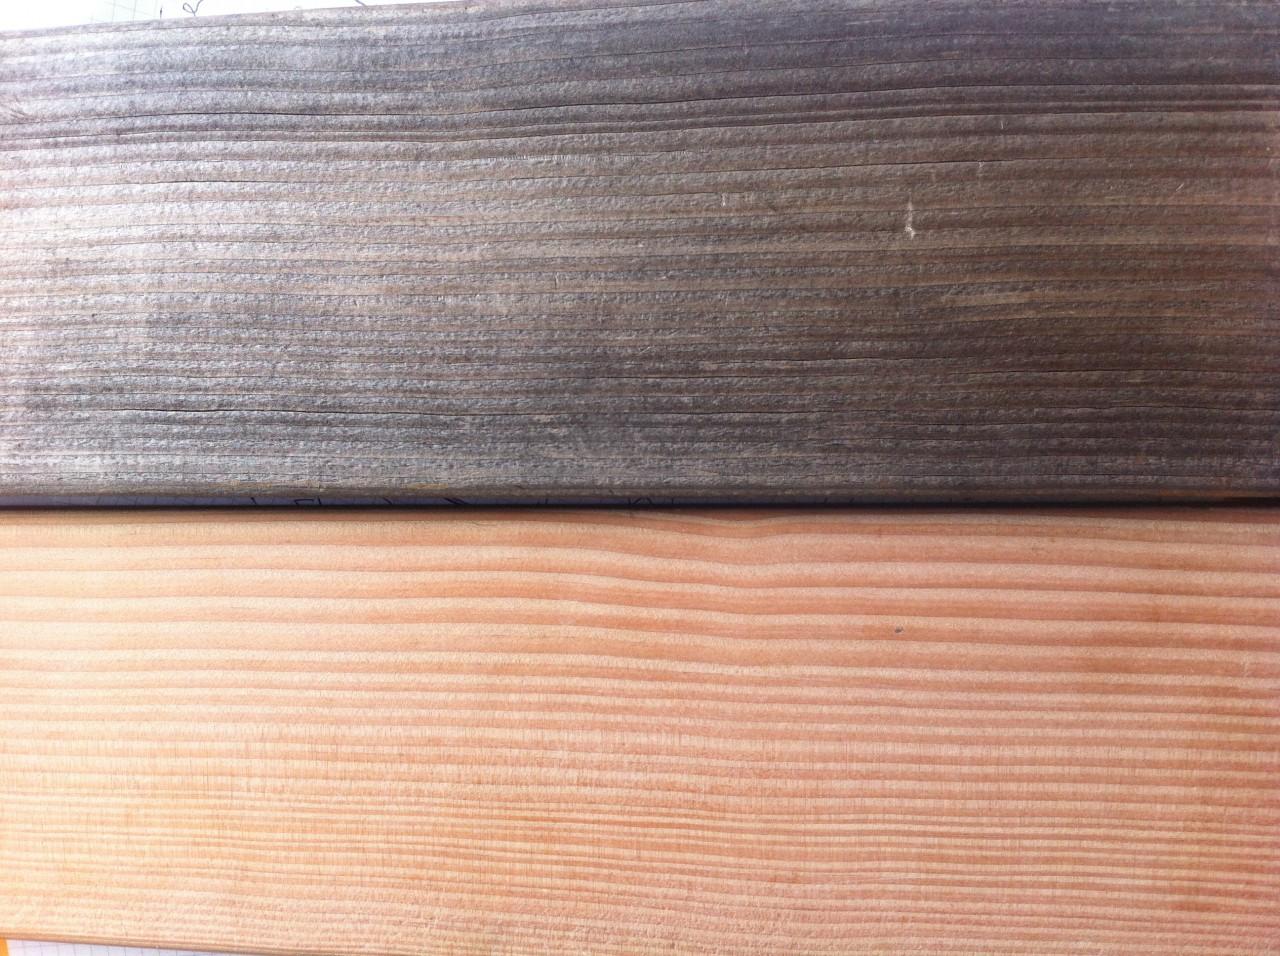 douglasie holzterrasse mit grauer patina bs holzdesign. Black Bedroom Furniture Sets. Home Design Ideas